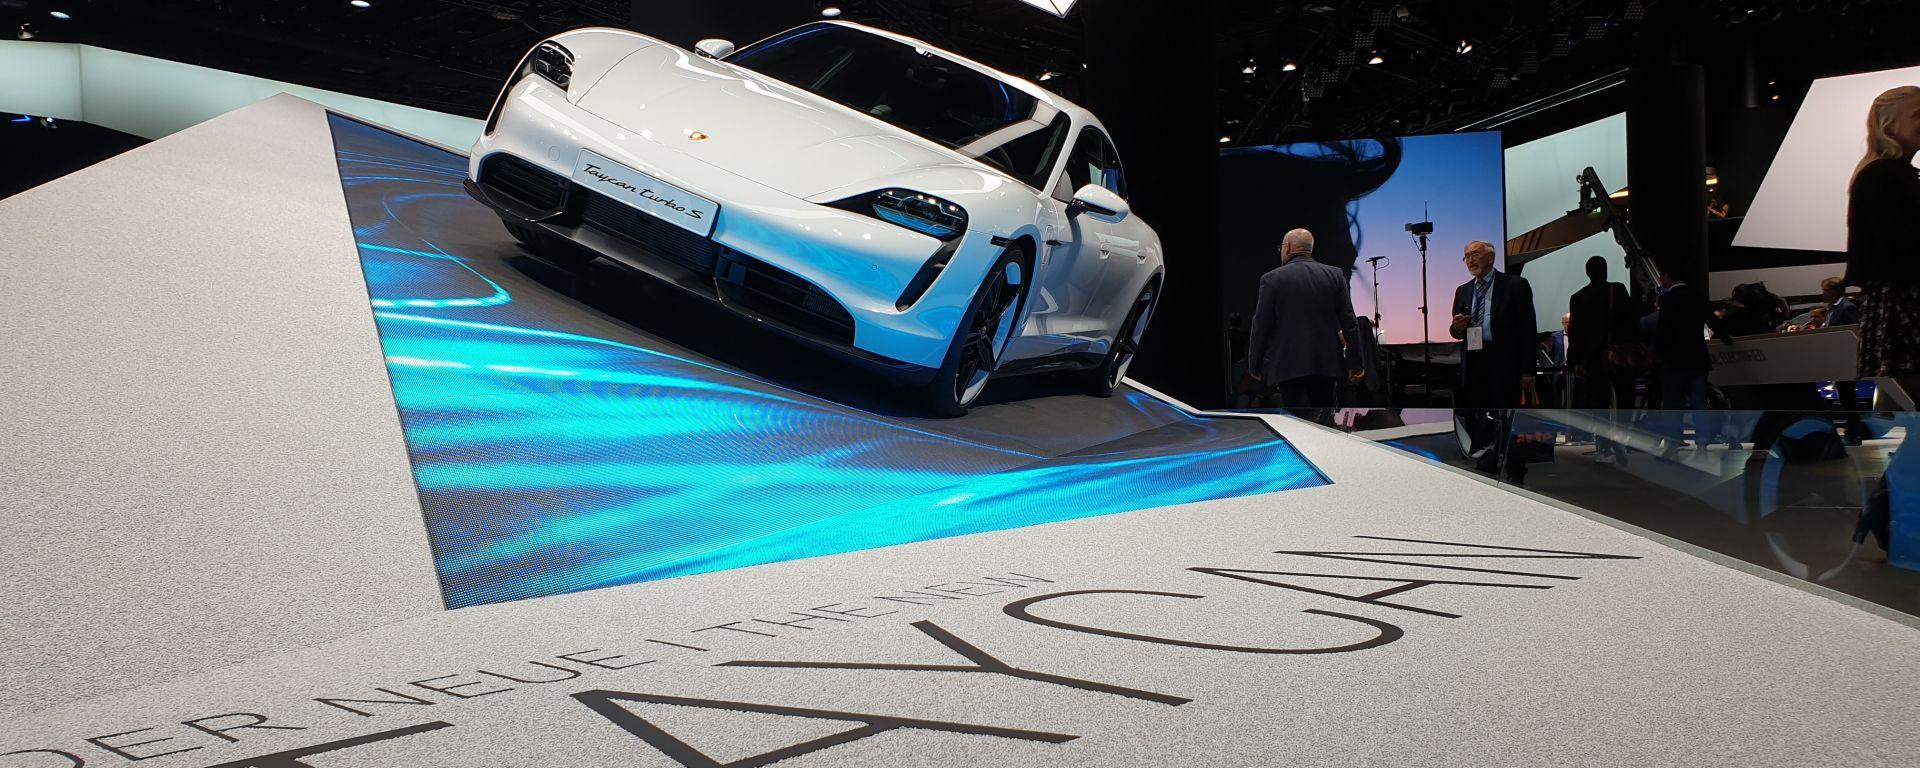 Nuova Porsche Taycan a Francoforte 2019